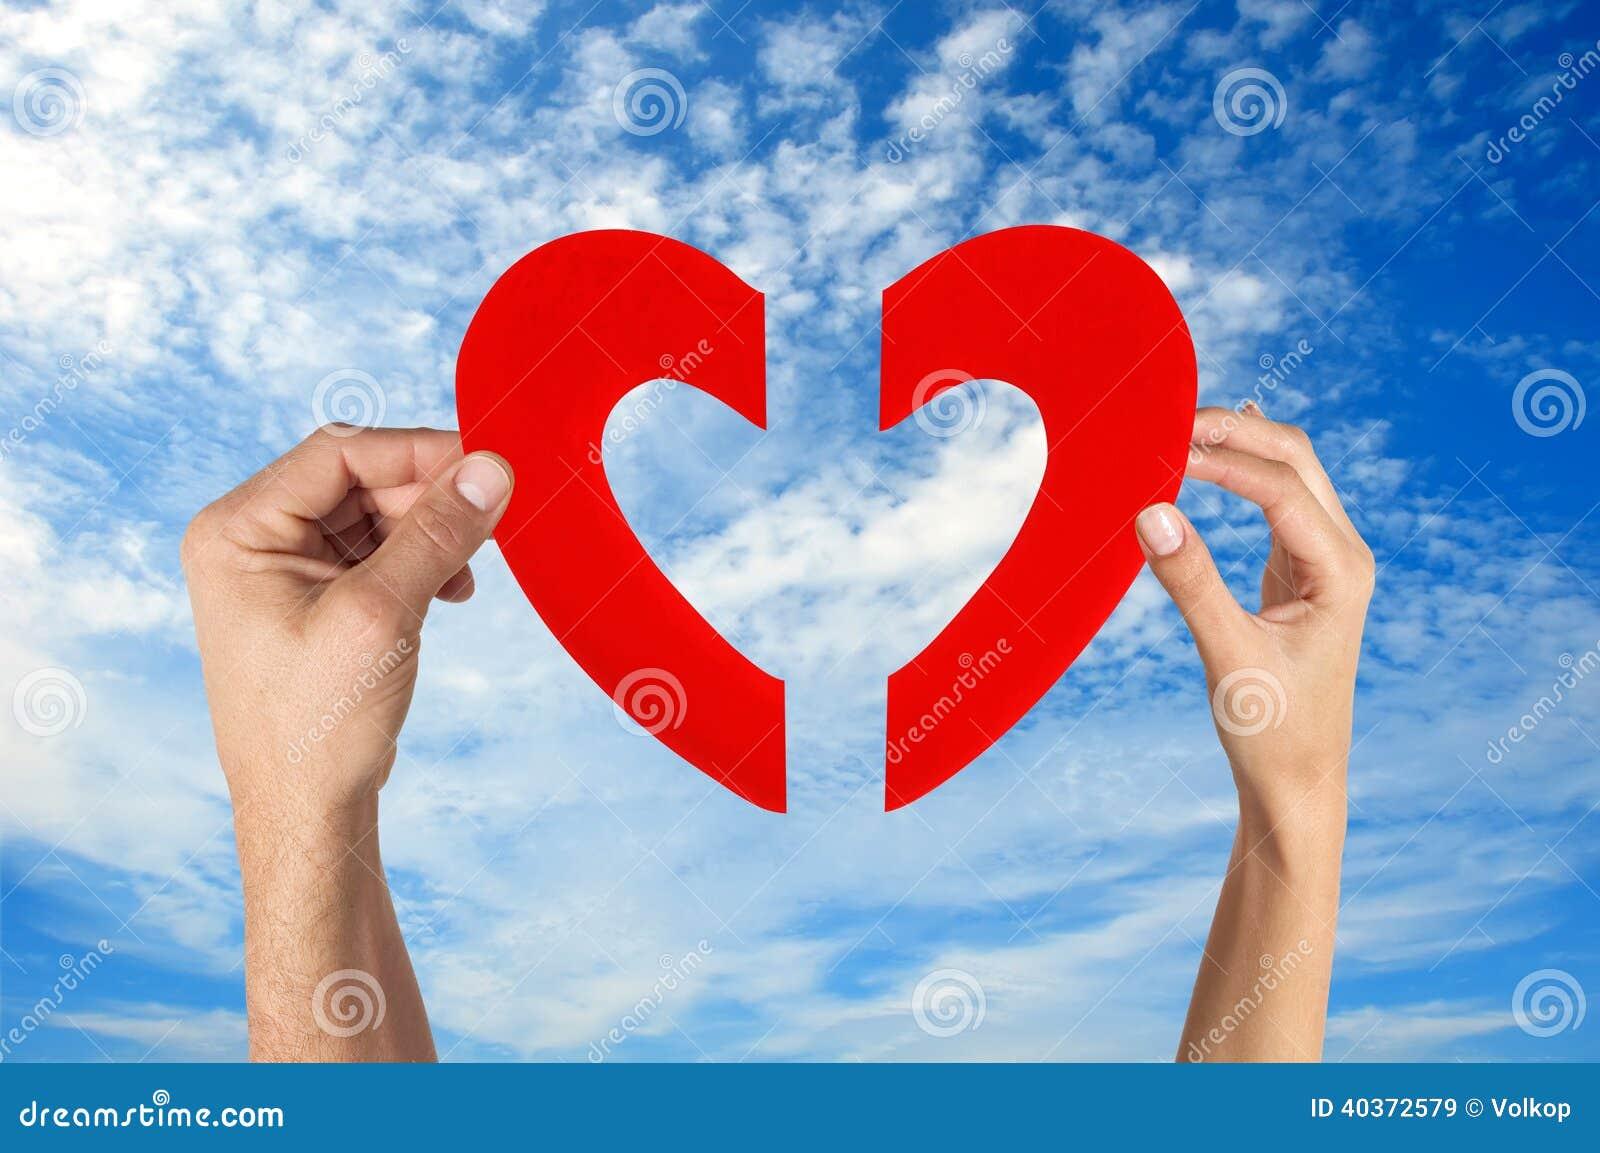 half hand heart gallery - photo #17